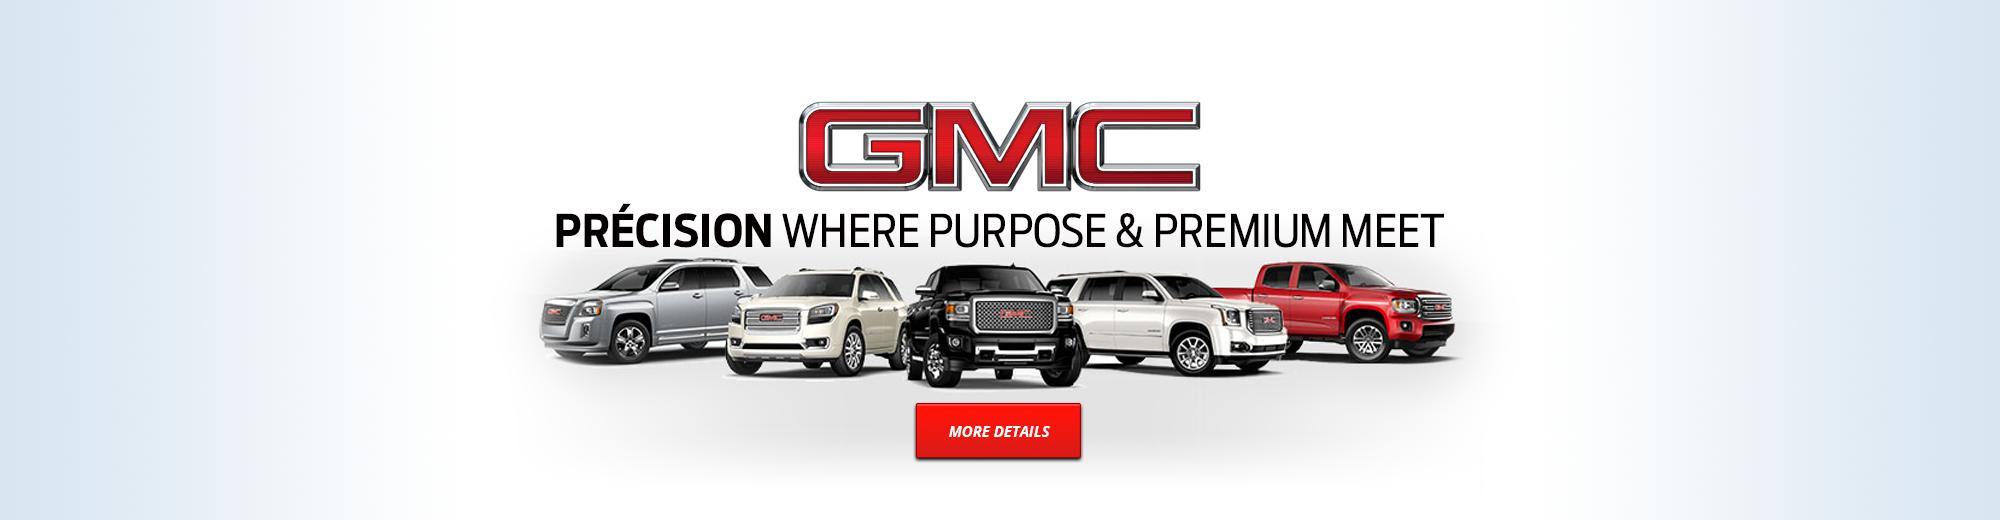 GMC   Precision where purpose & premium meet